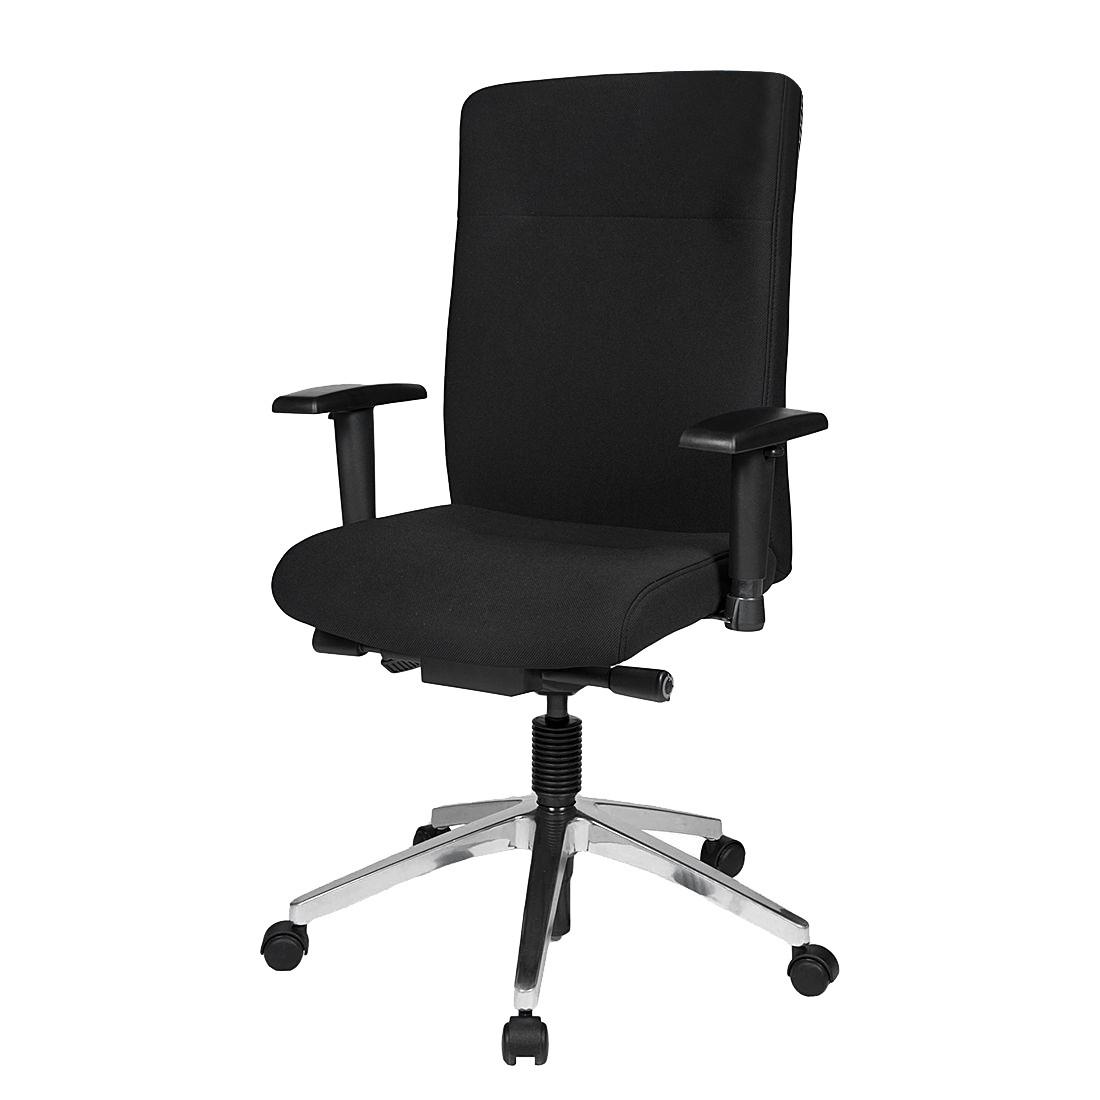 home24 Buerostuhl Linz II | Büro > Bürostühle und Sessel  > Bürostühle | Schwarz | Textil | Duo Collection